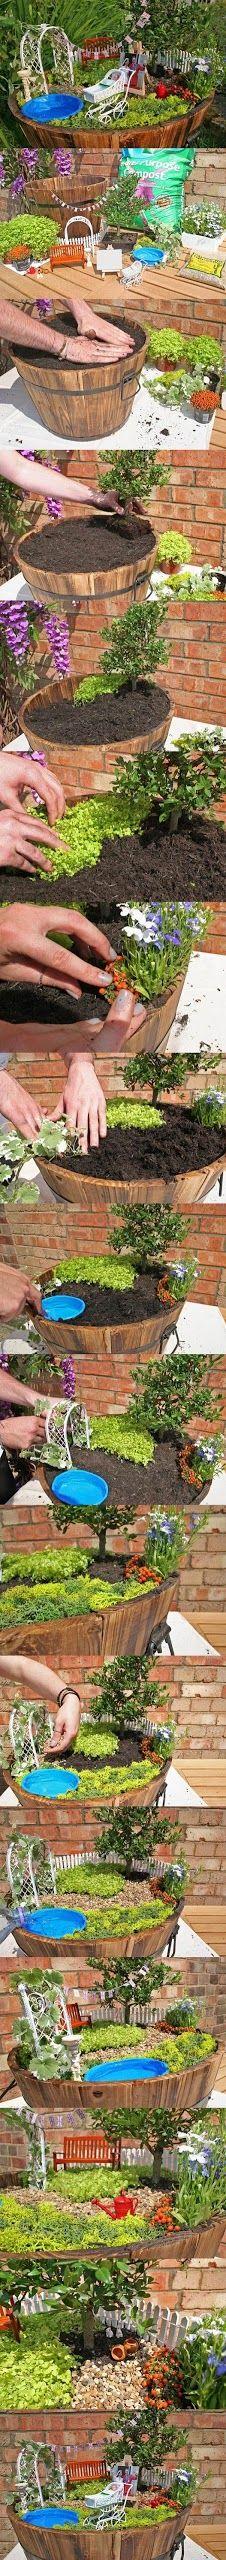 Diy Projects: DIY Miniature Fairy Garden